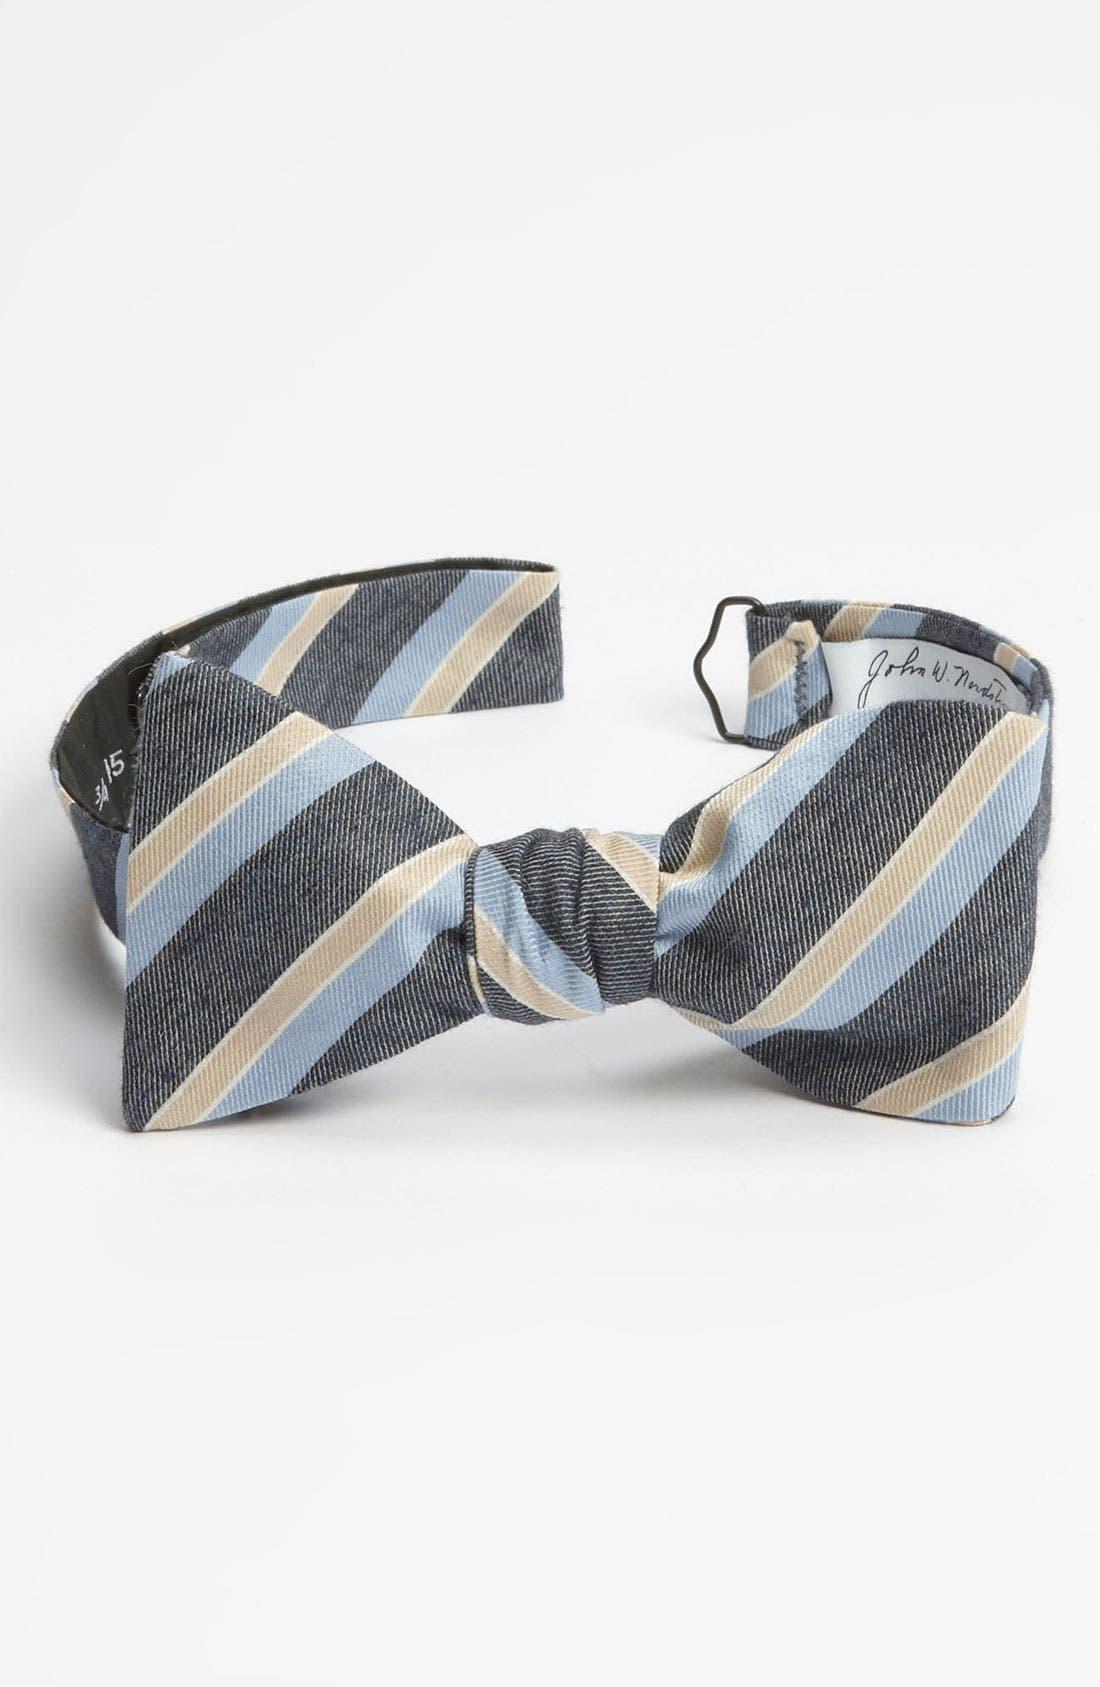 Main Image - John W. Nordstrom Silk Bow Tie